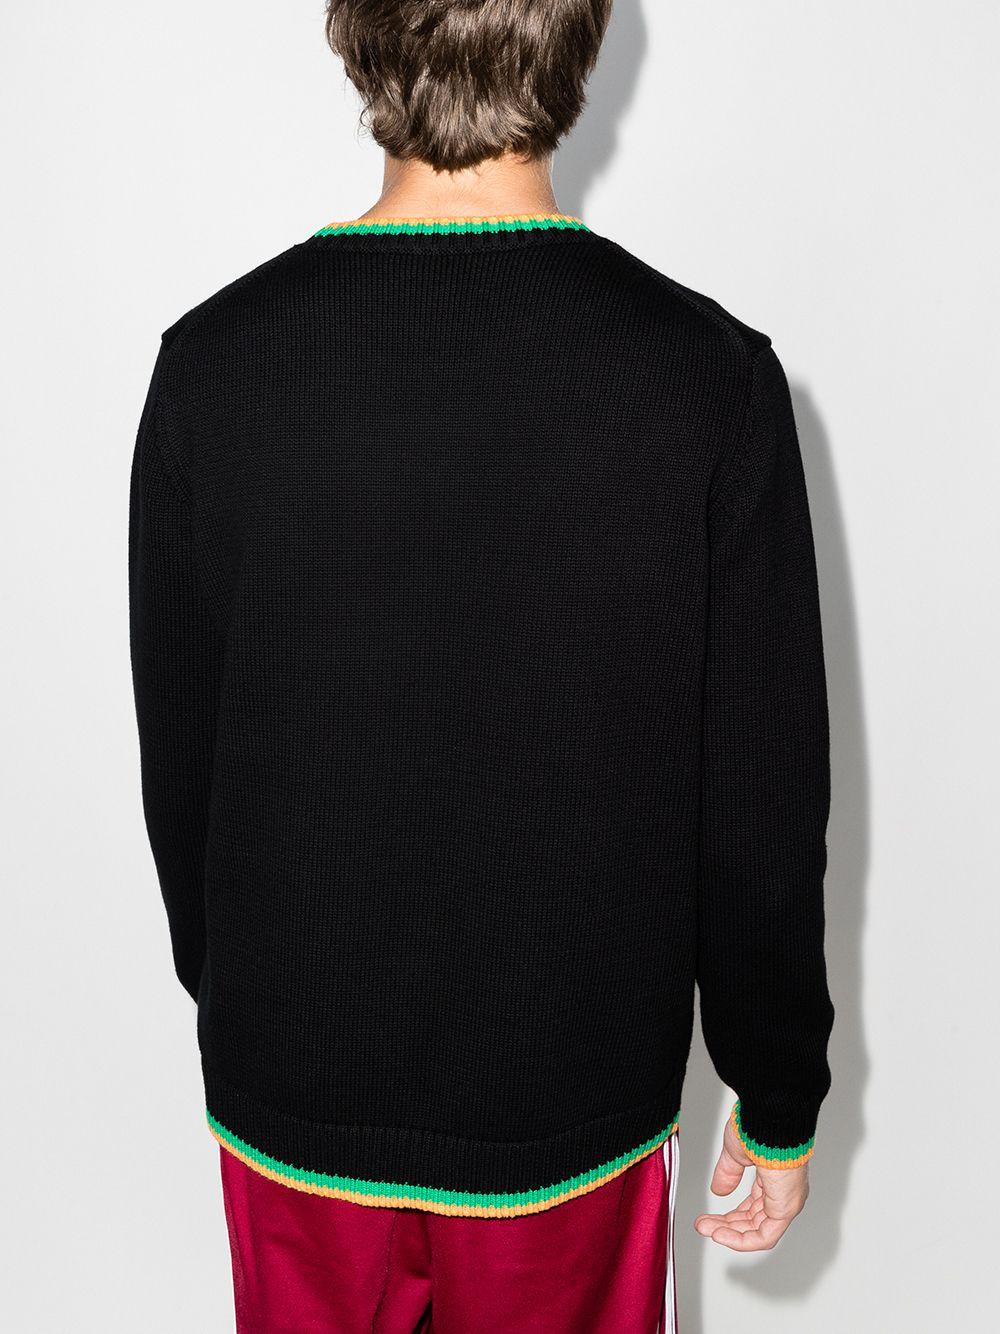 crew neck sweater man black in cotton CASABLANCA   Sweaters   MF21-KW-116BLACK